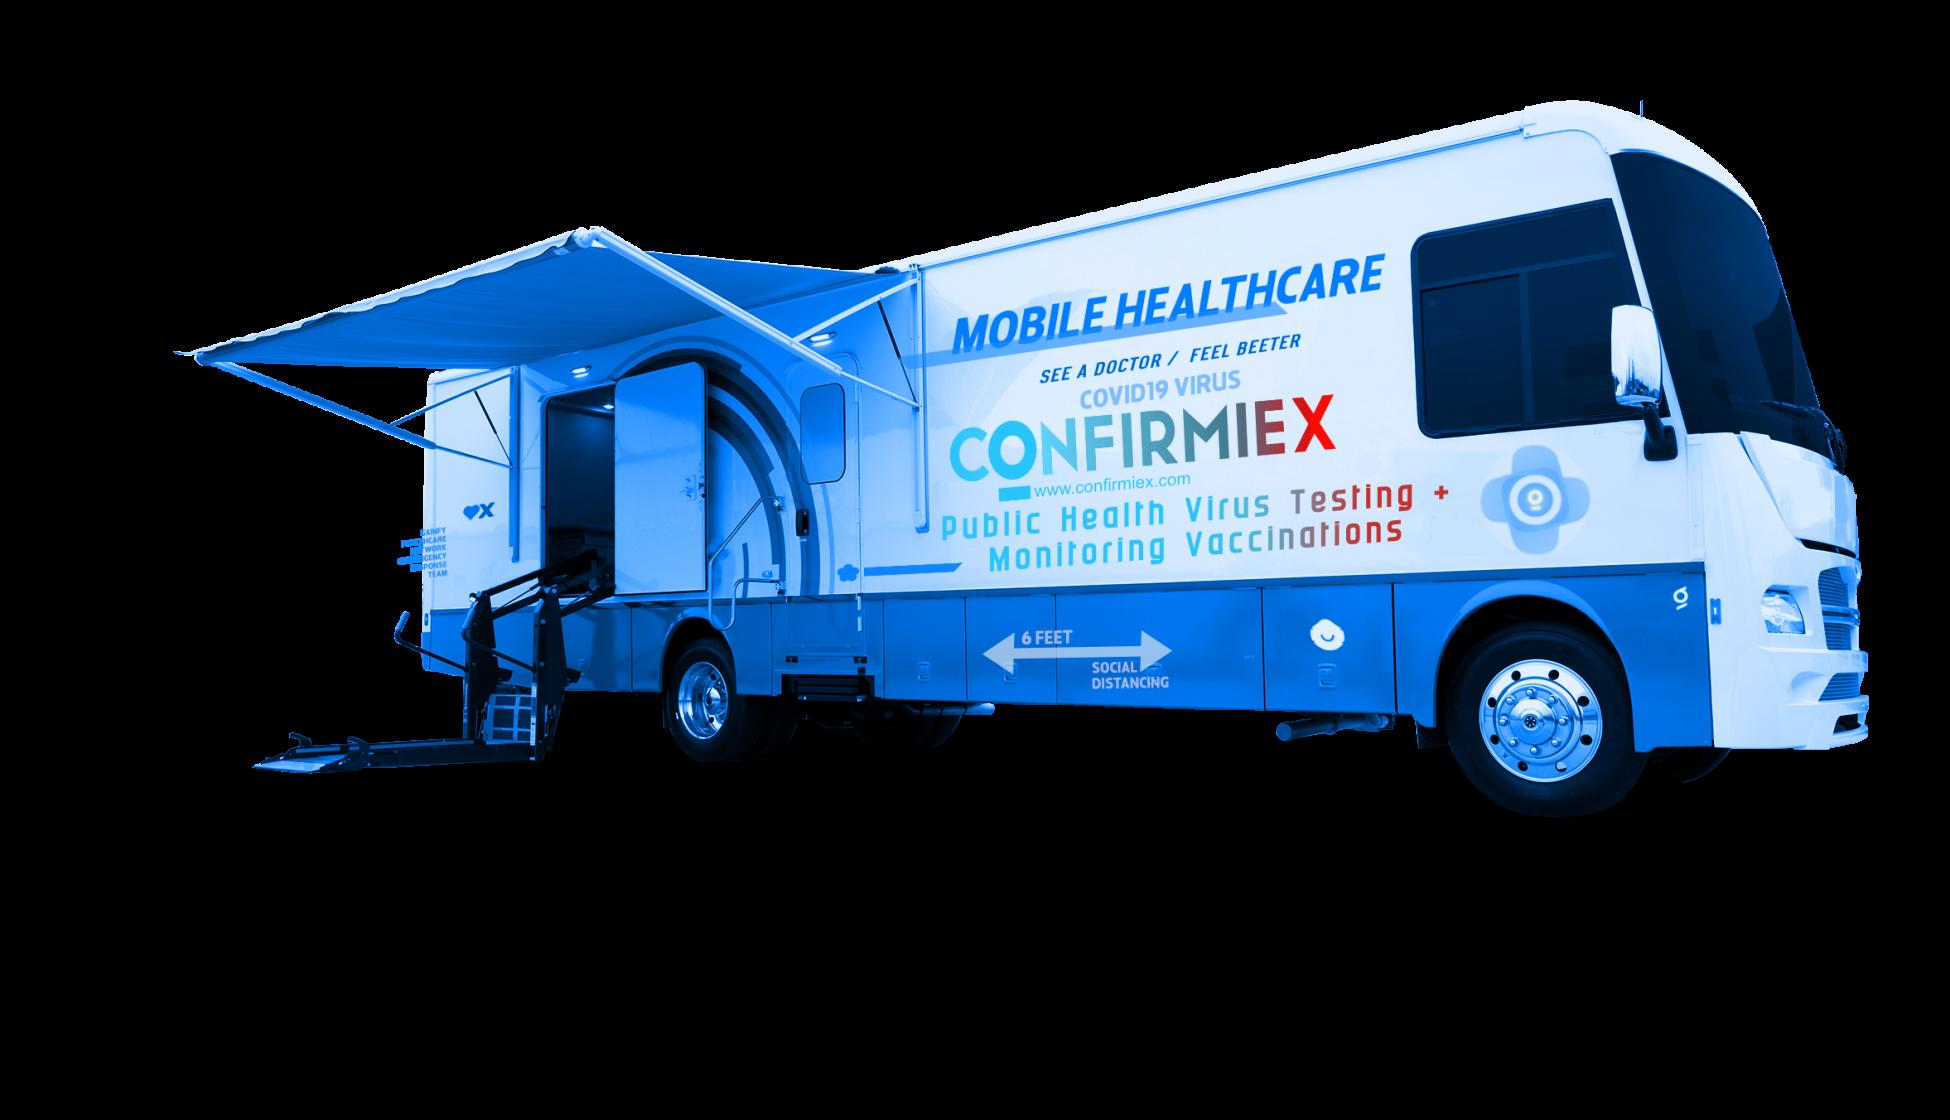 Confirmiex-Health_busoutlined-2